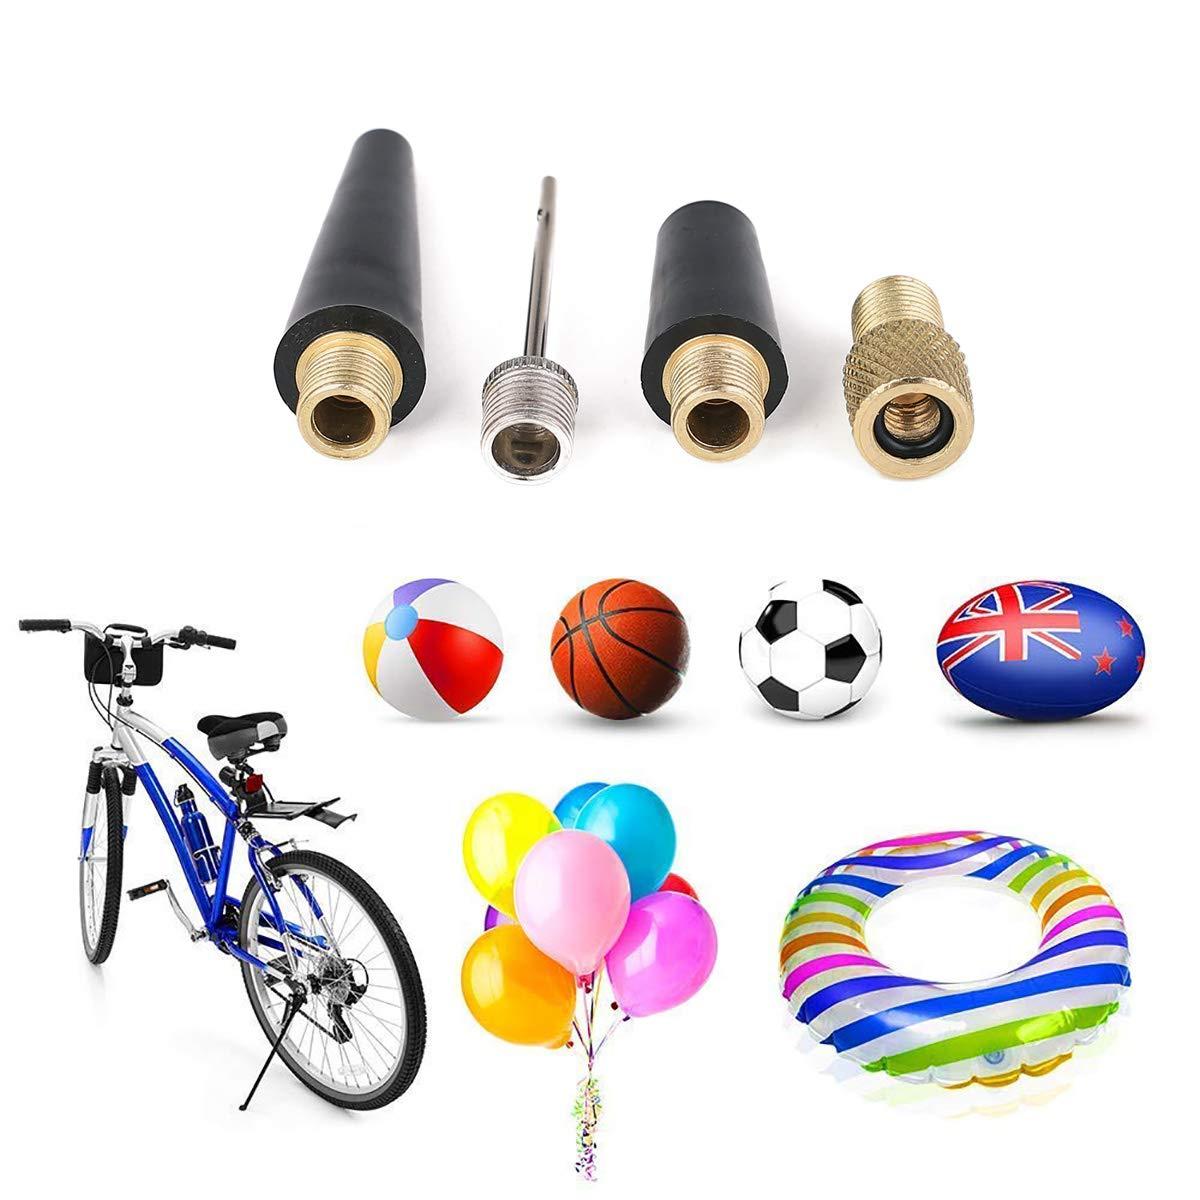 4Pcs Set Flammi Bike Tire Inflator Ball Pump Needle Nozzle Adapter Kit Sports